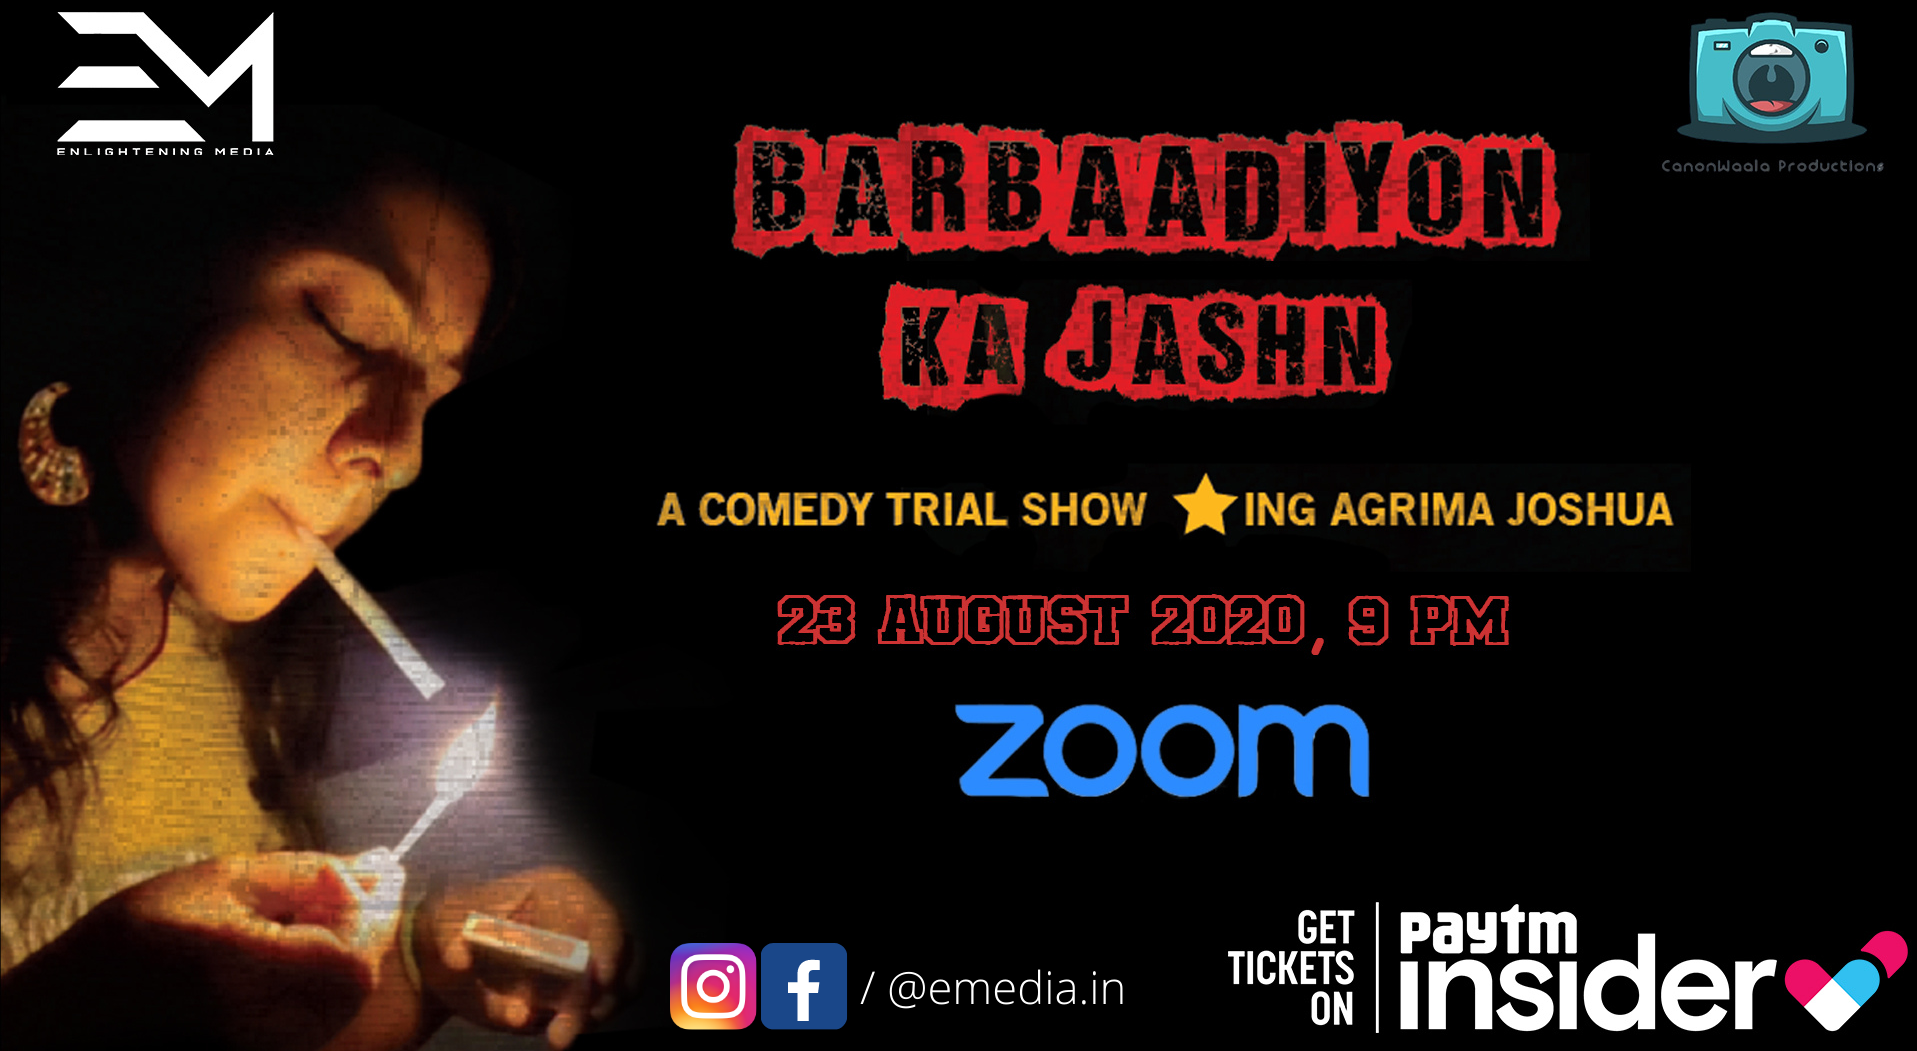 Barbaadiyon Ka Jashn By AGRIMA JOSHUA – A Comedy Trial Show